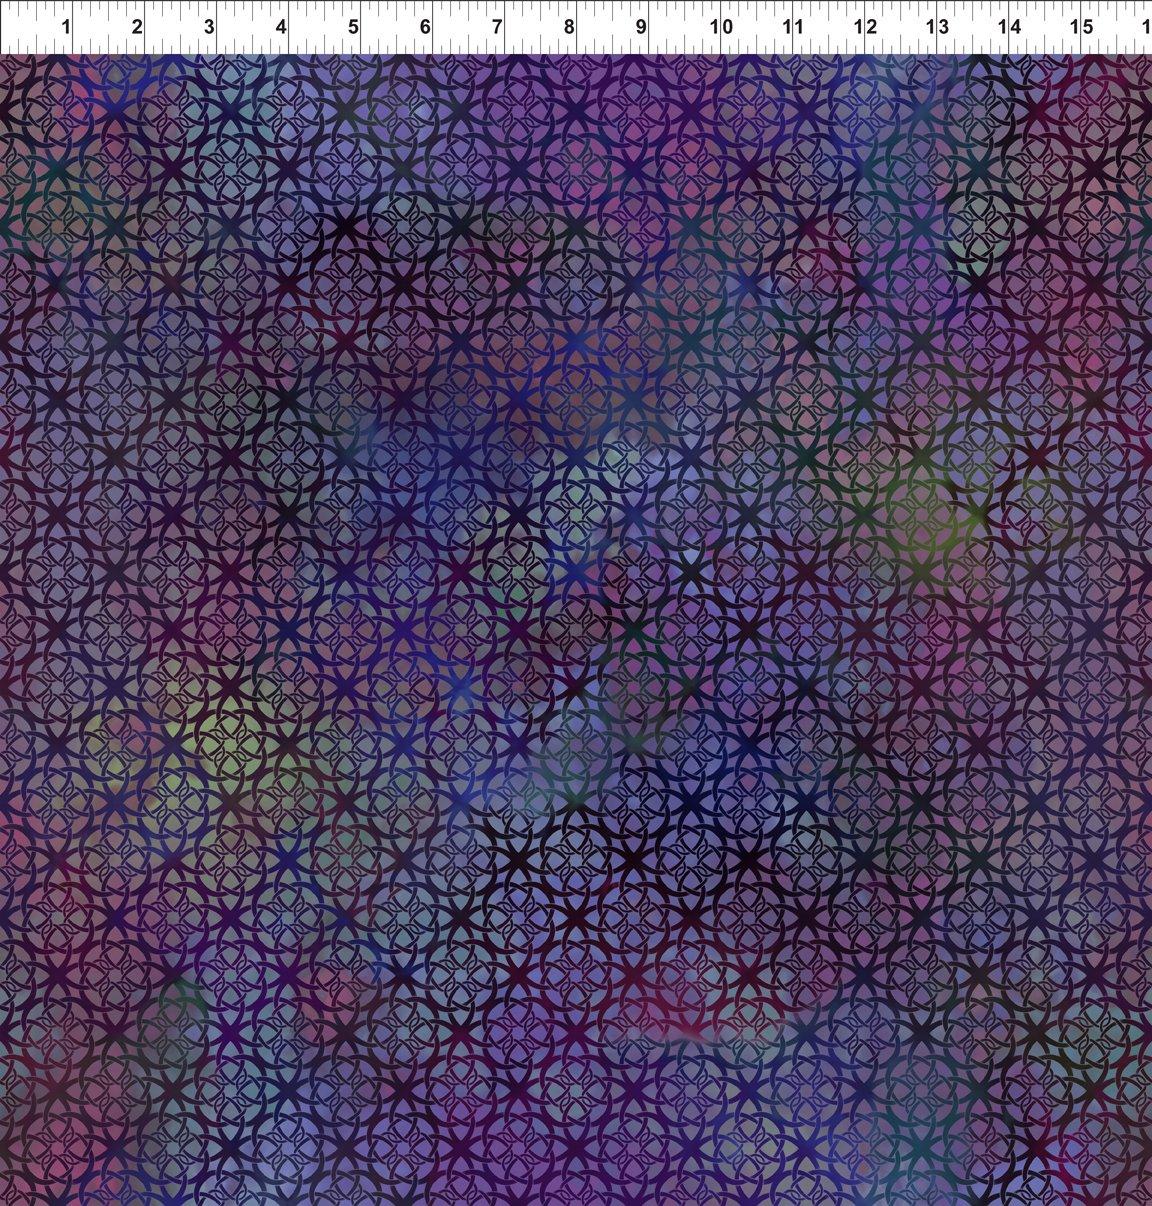 In The Beginning - Diaphanous-Trellis/Mulberry - 7ENC4